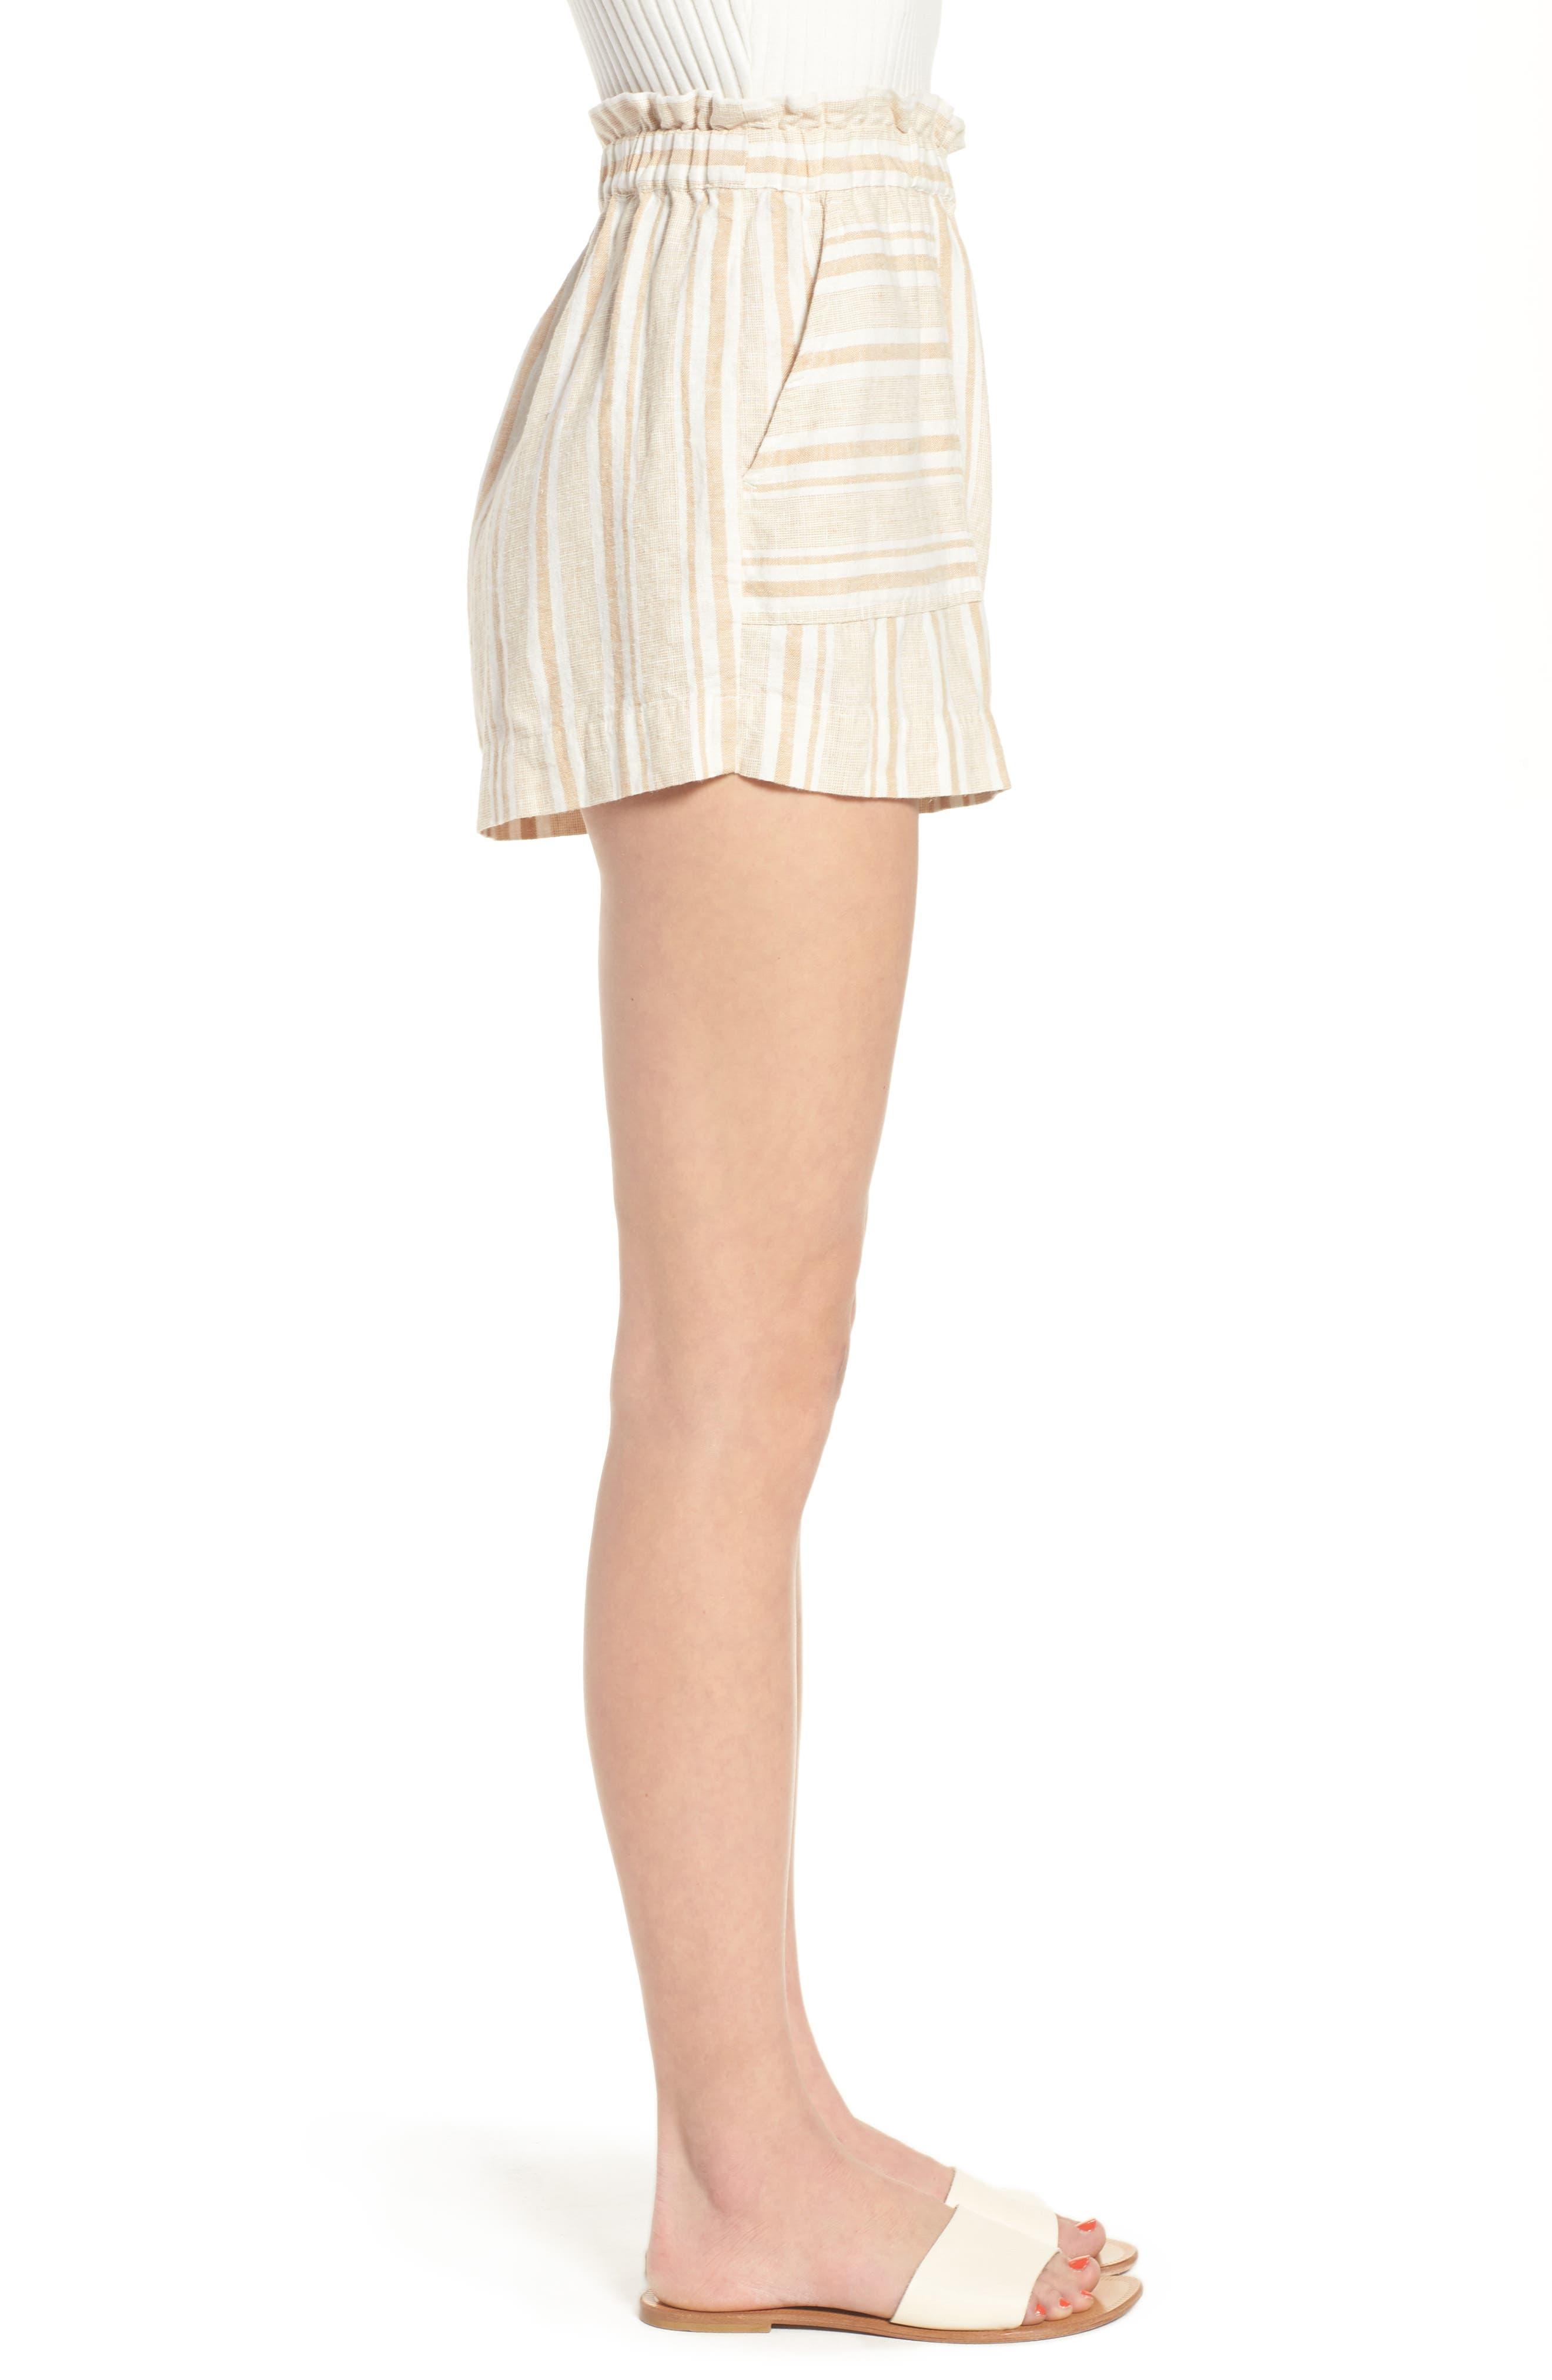 Stripe Linen Blend Shorts,                             Alternate thumbnail 3, color,                             Tan Lark Viola Stripe